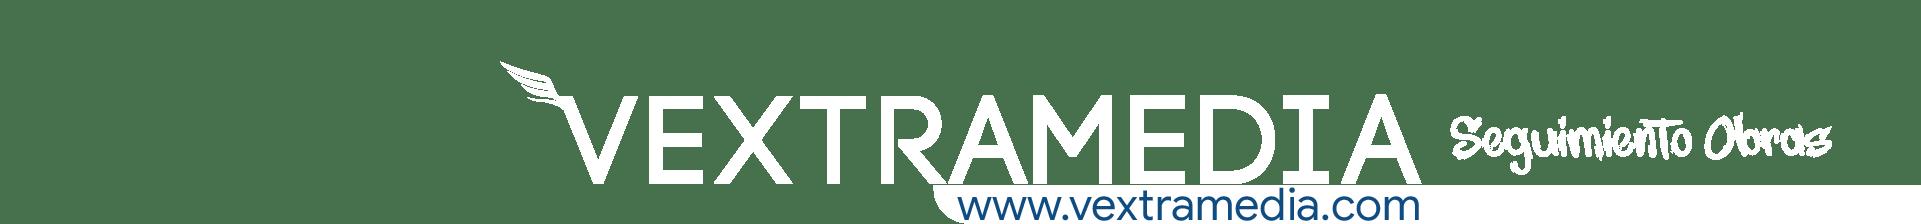 cabecera-seguimiento-de-obras-vextramedia-